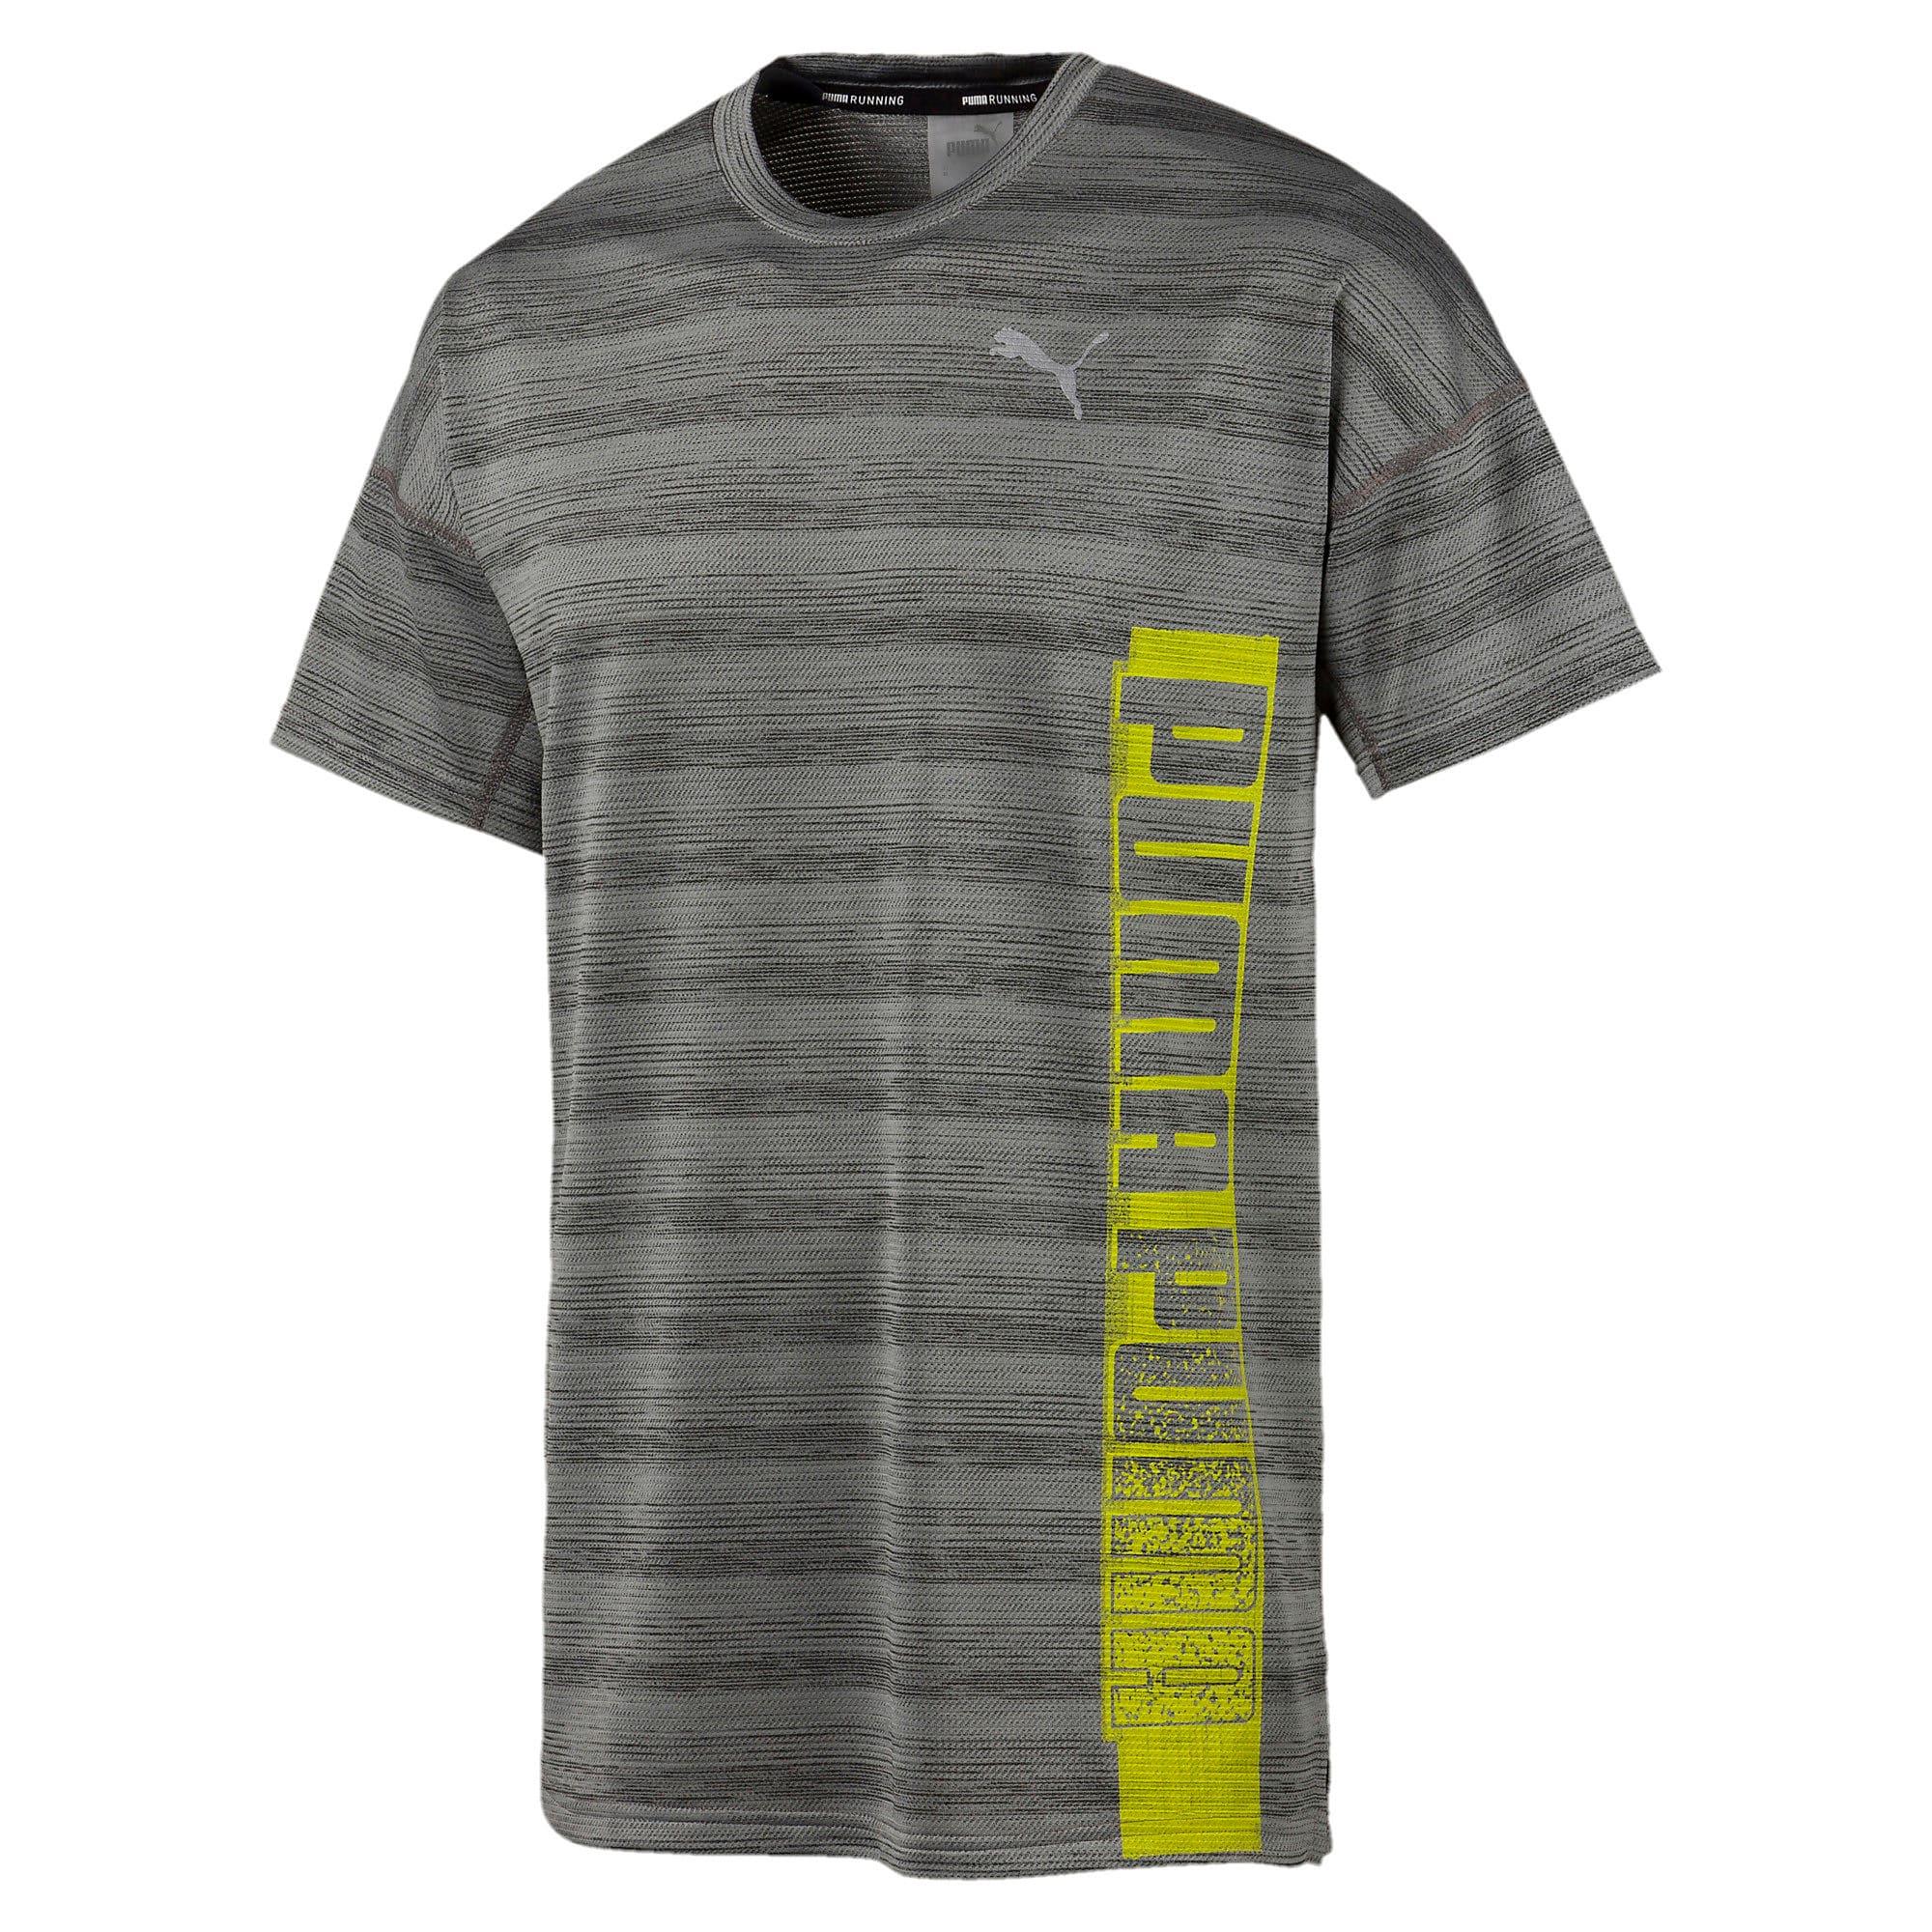 Thumbnail 4 of LAST LAP ヘザー SS ランニング Tシャツ 半袖, Medium Gray Heather, medium-JPN